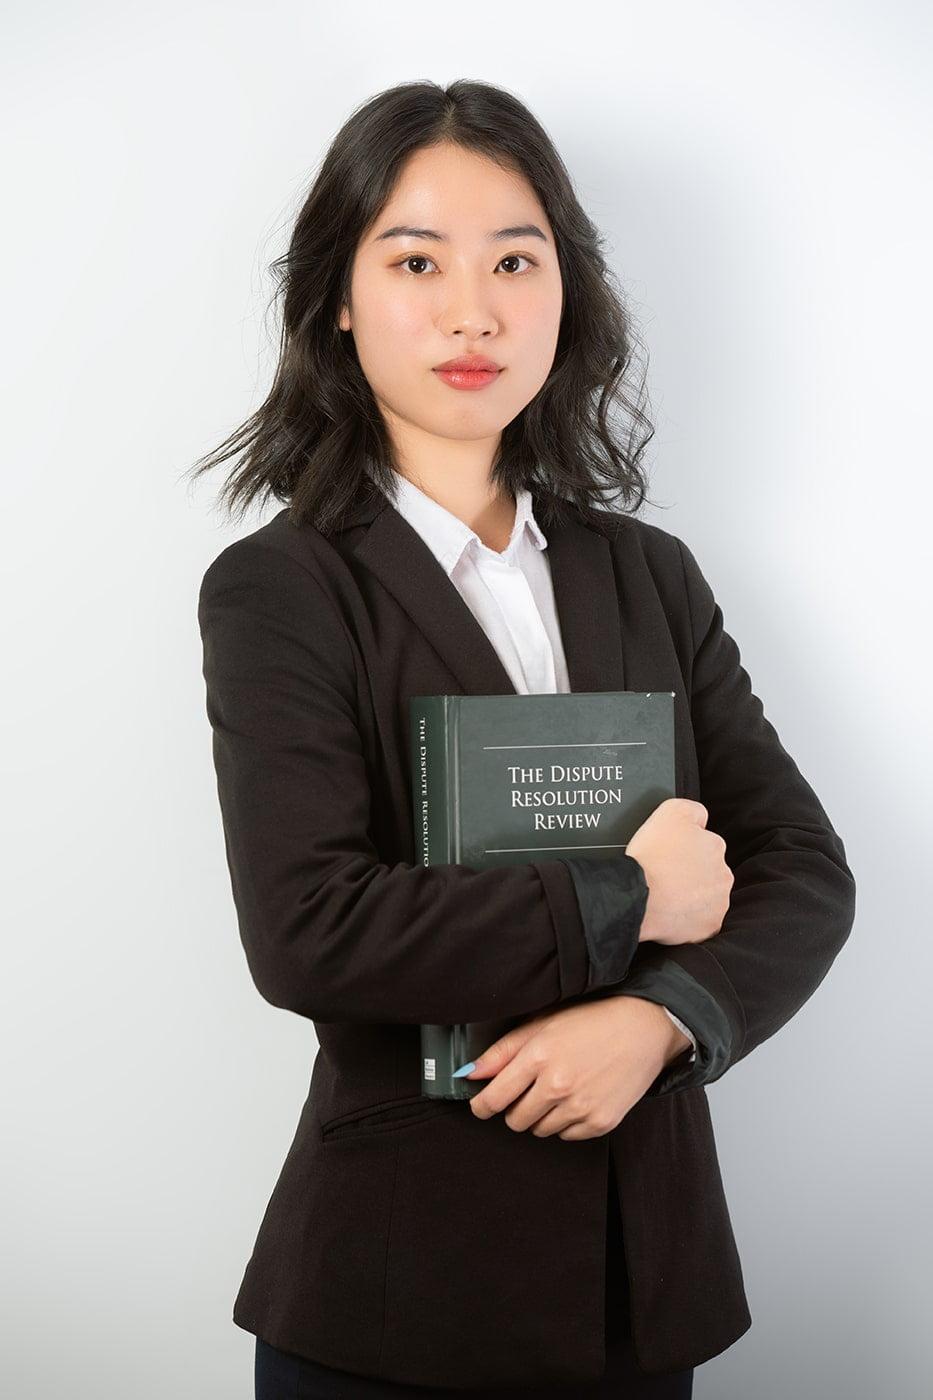 Profile cong ty 18 - Album chụp ảnh profile công ty Luật Dzungsrt Law - HThao Studio